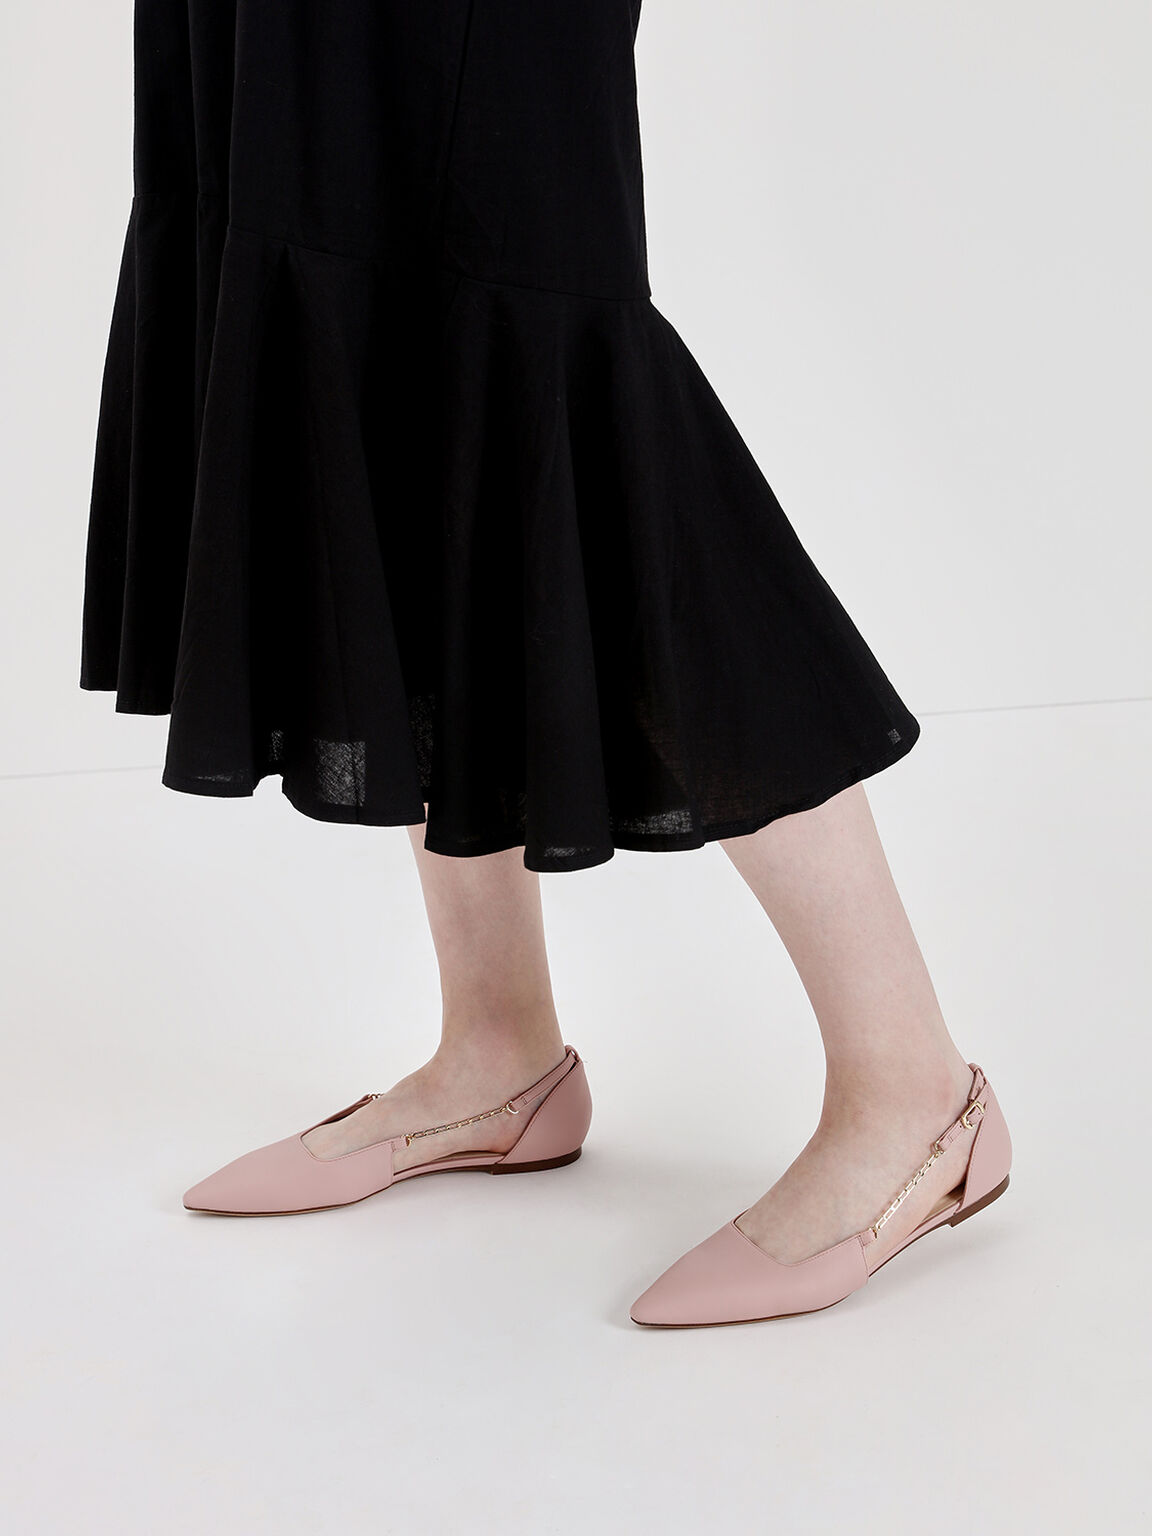 Chain Strap Ballerina Flats, Nude, hi-res